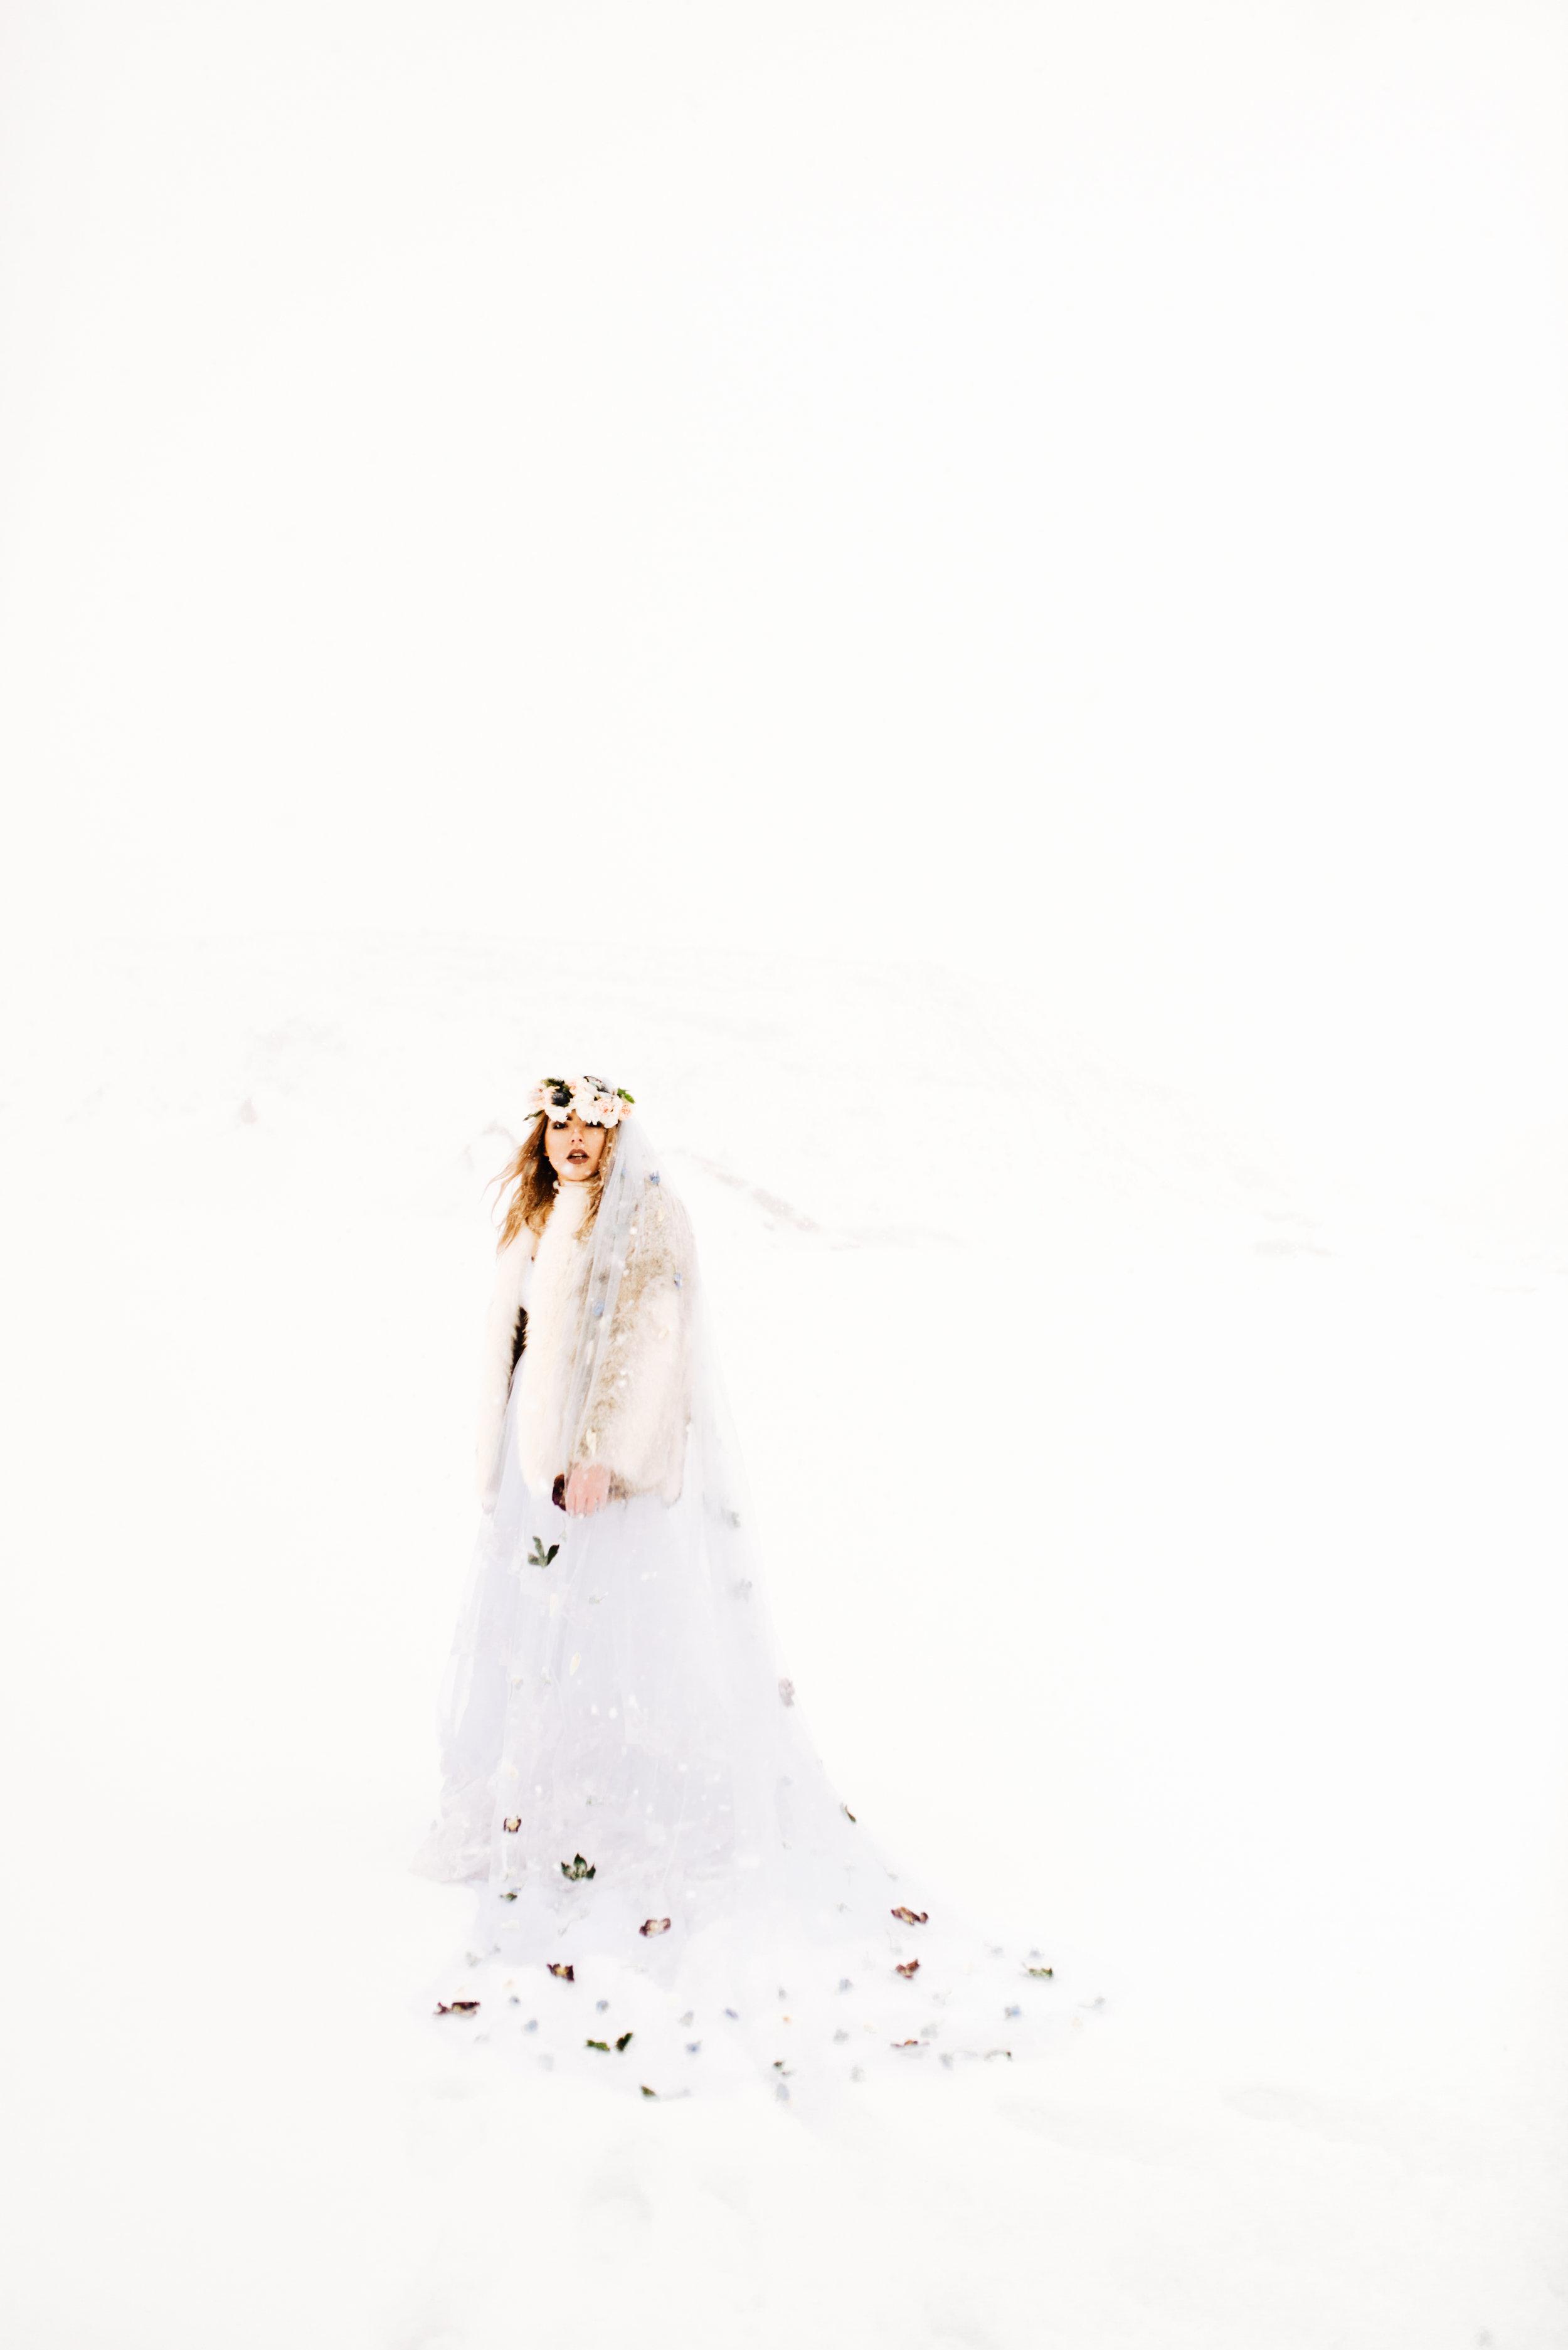 ShelbyTaylorPhotography-94.jpg